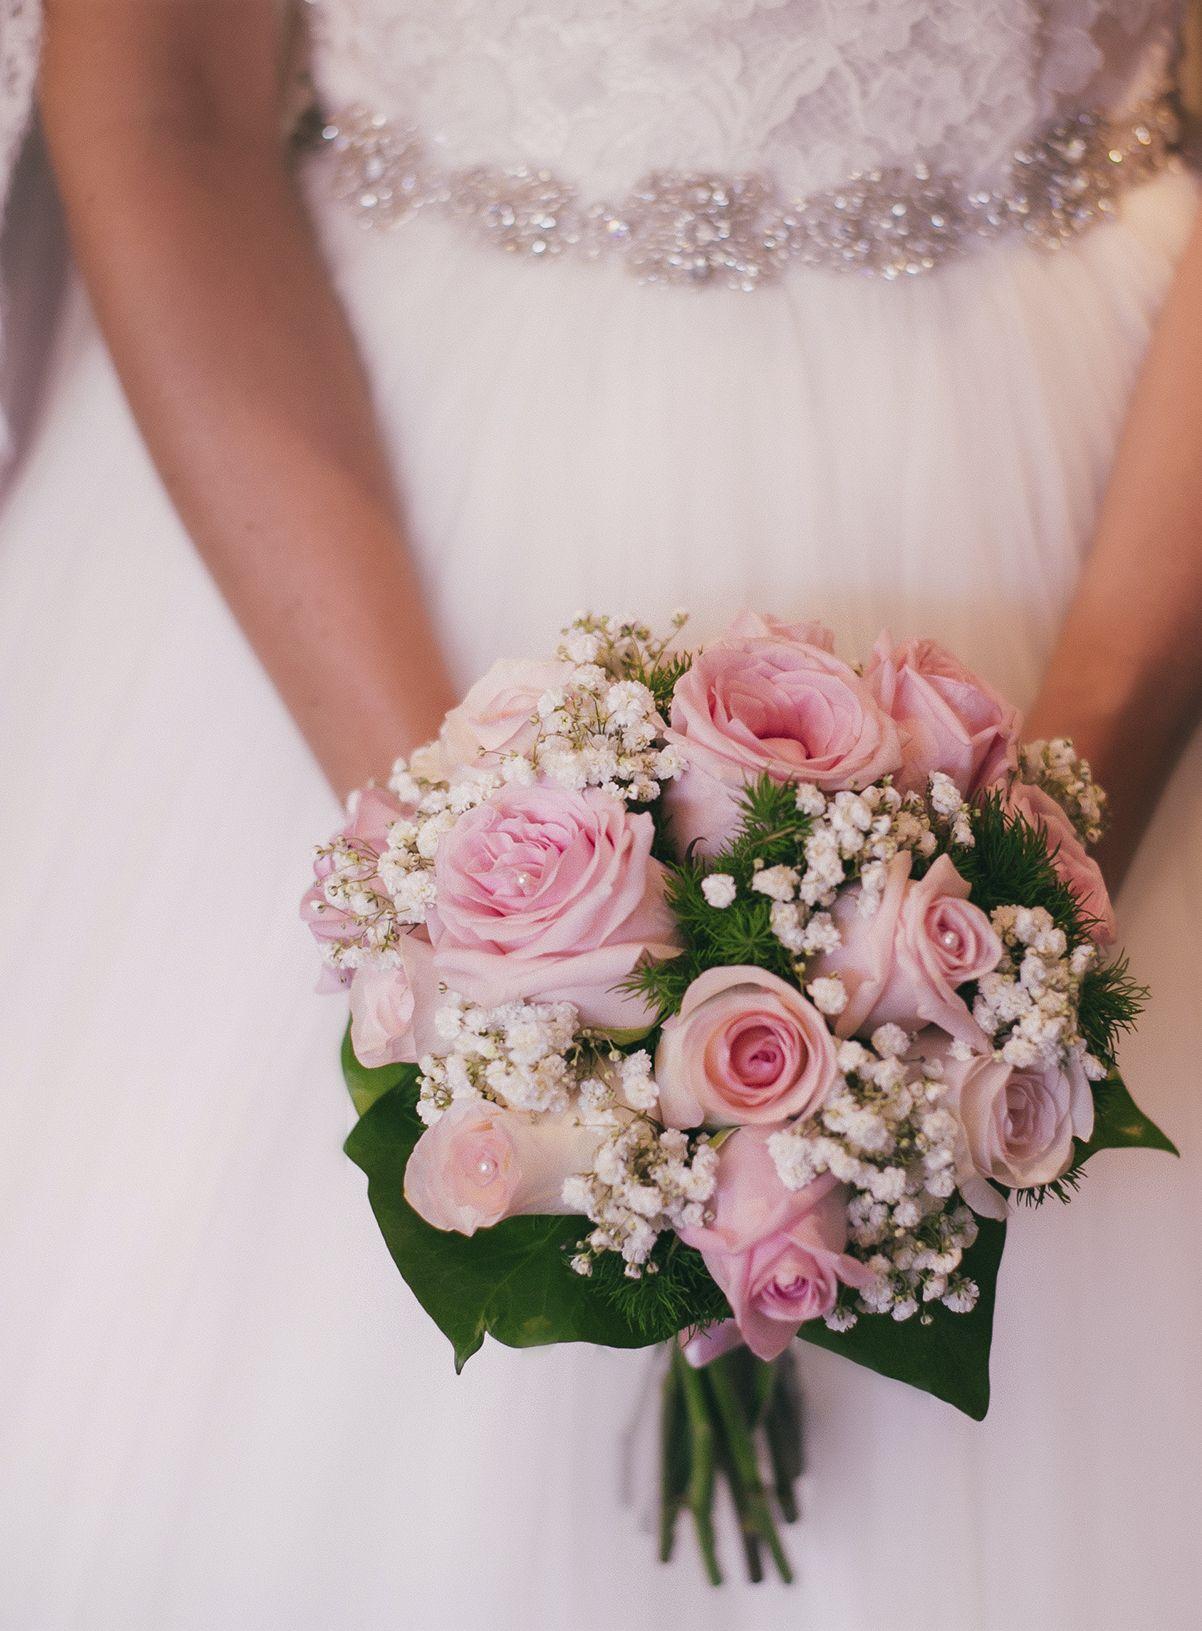 Ramo de novia rosa | Proyectos que debo intentar | Pinterest | De ...